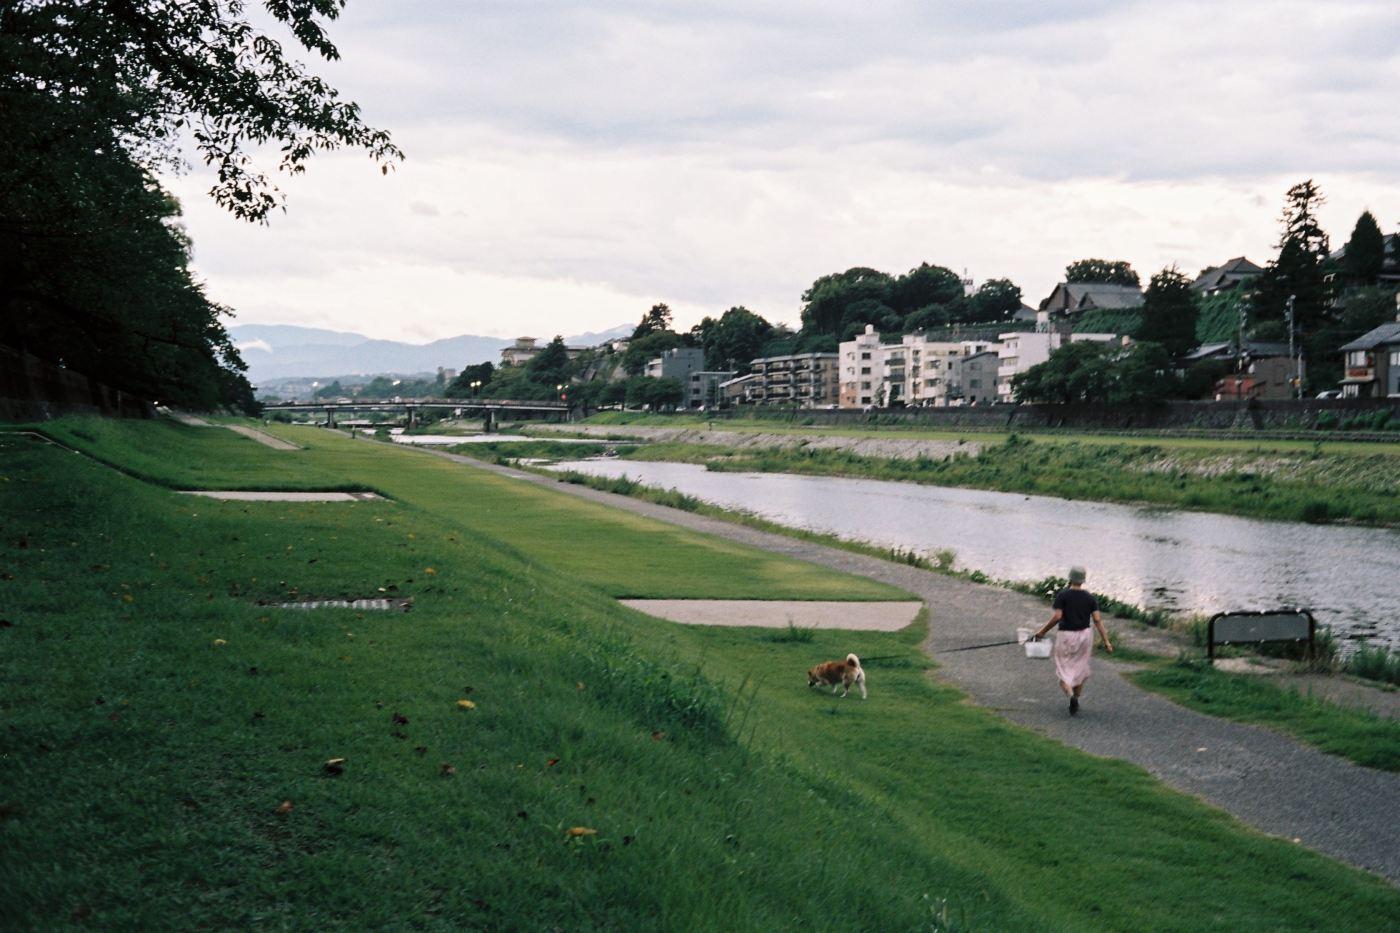 Sai River, Kanazawa - shot with Canonet QL17 with Portra 160